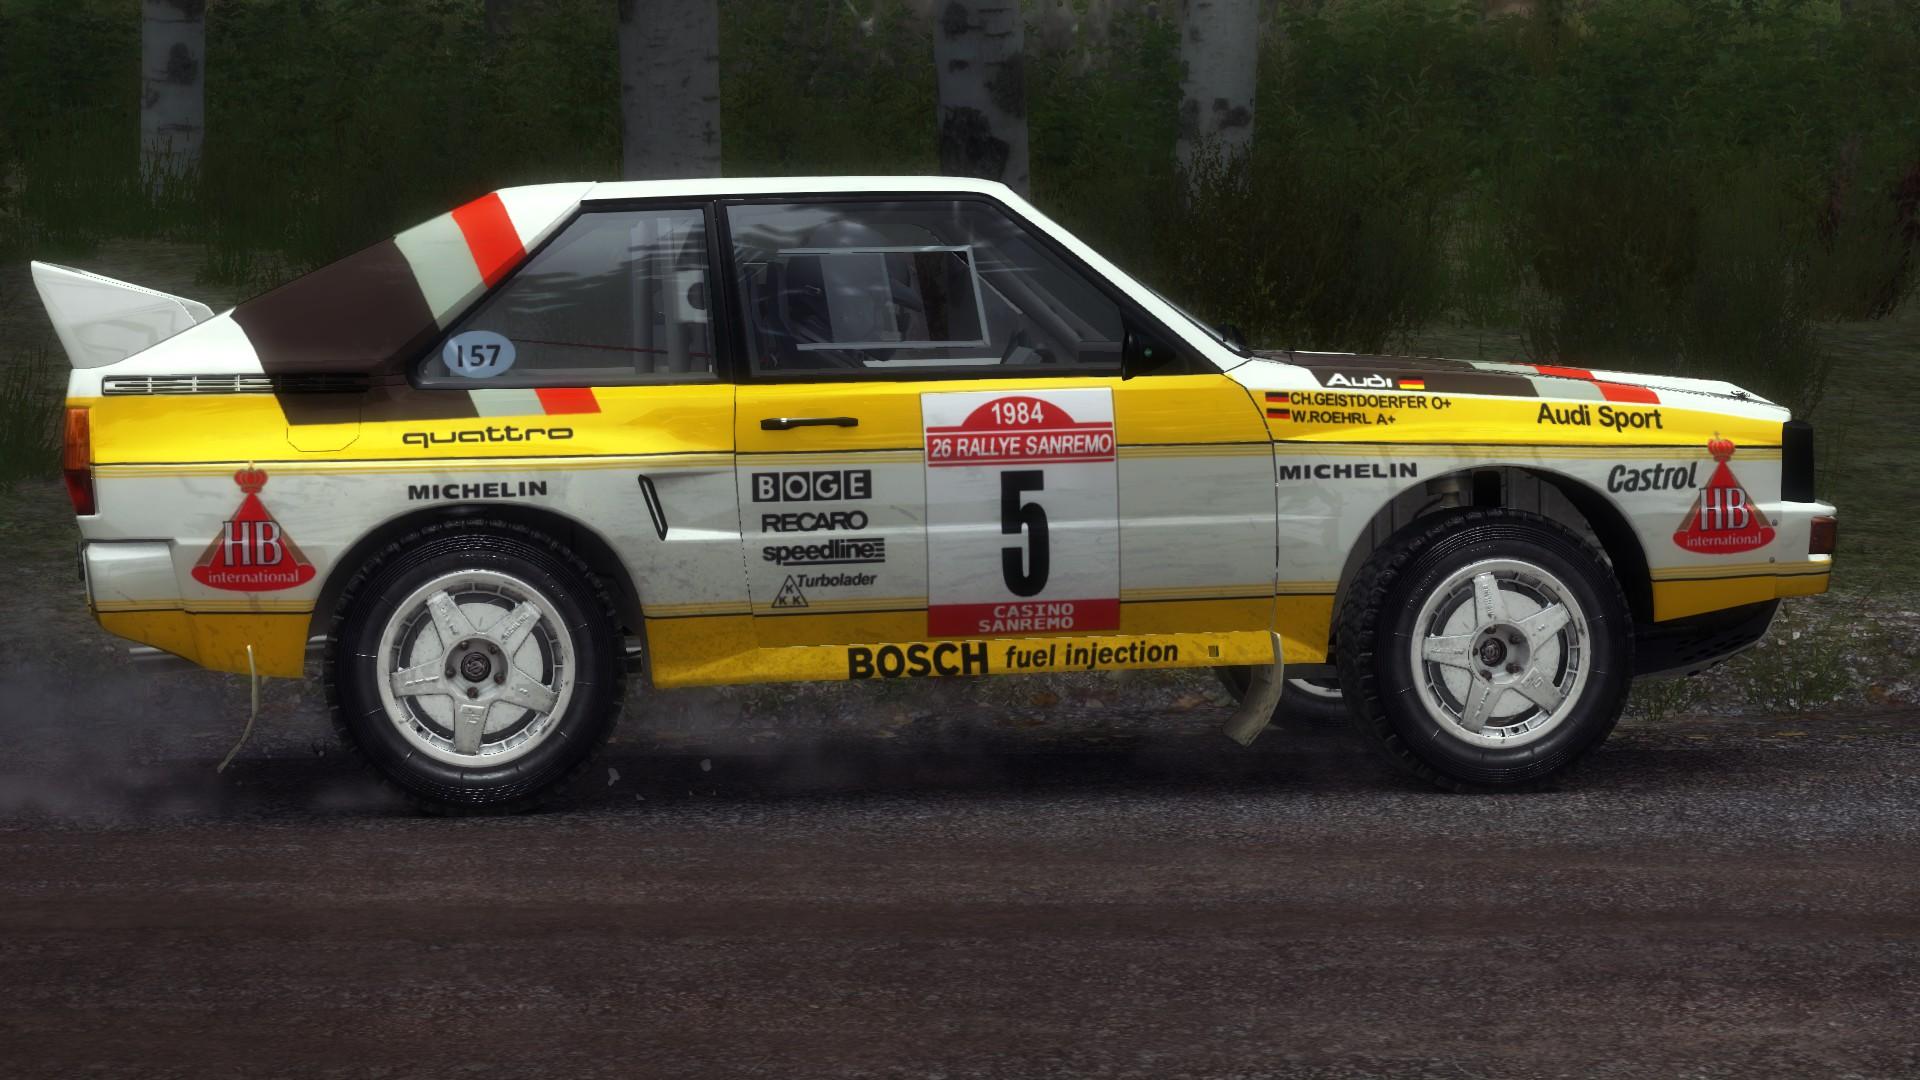 HB Audi 1984 livery for Audi Sport Quattro Rallye | RaceDepartment Audi Quattro Group B on alfa romeo group b, audi rally group b, audi 90 group b, ford group b, mitsubishi starion group b, audi s2 group b, audi wrc, audi cars, audi sport, opel manta group b, ferrari group b, subaru impreza group b, bmw group b, peugeot group b, renault group b, porsche group b, lancia group b,